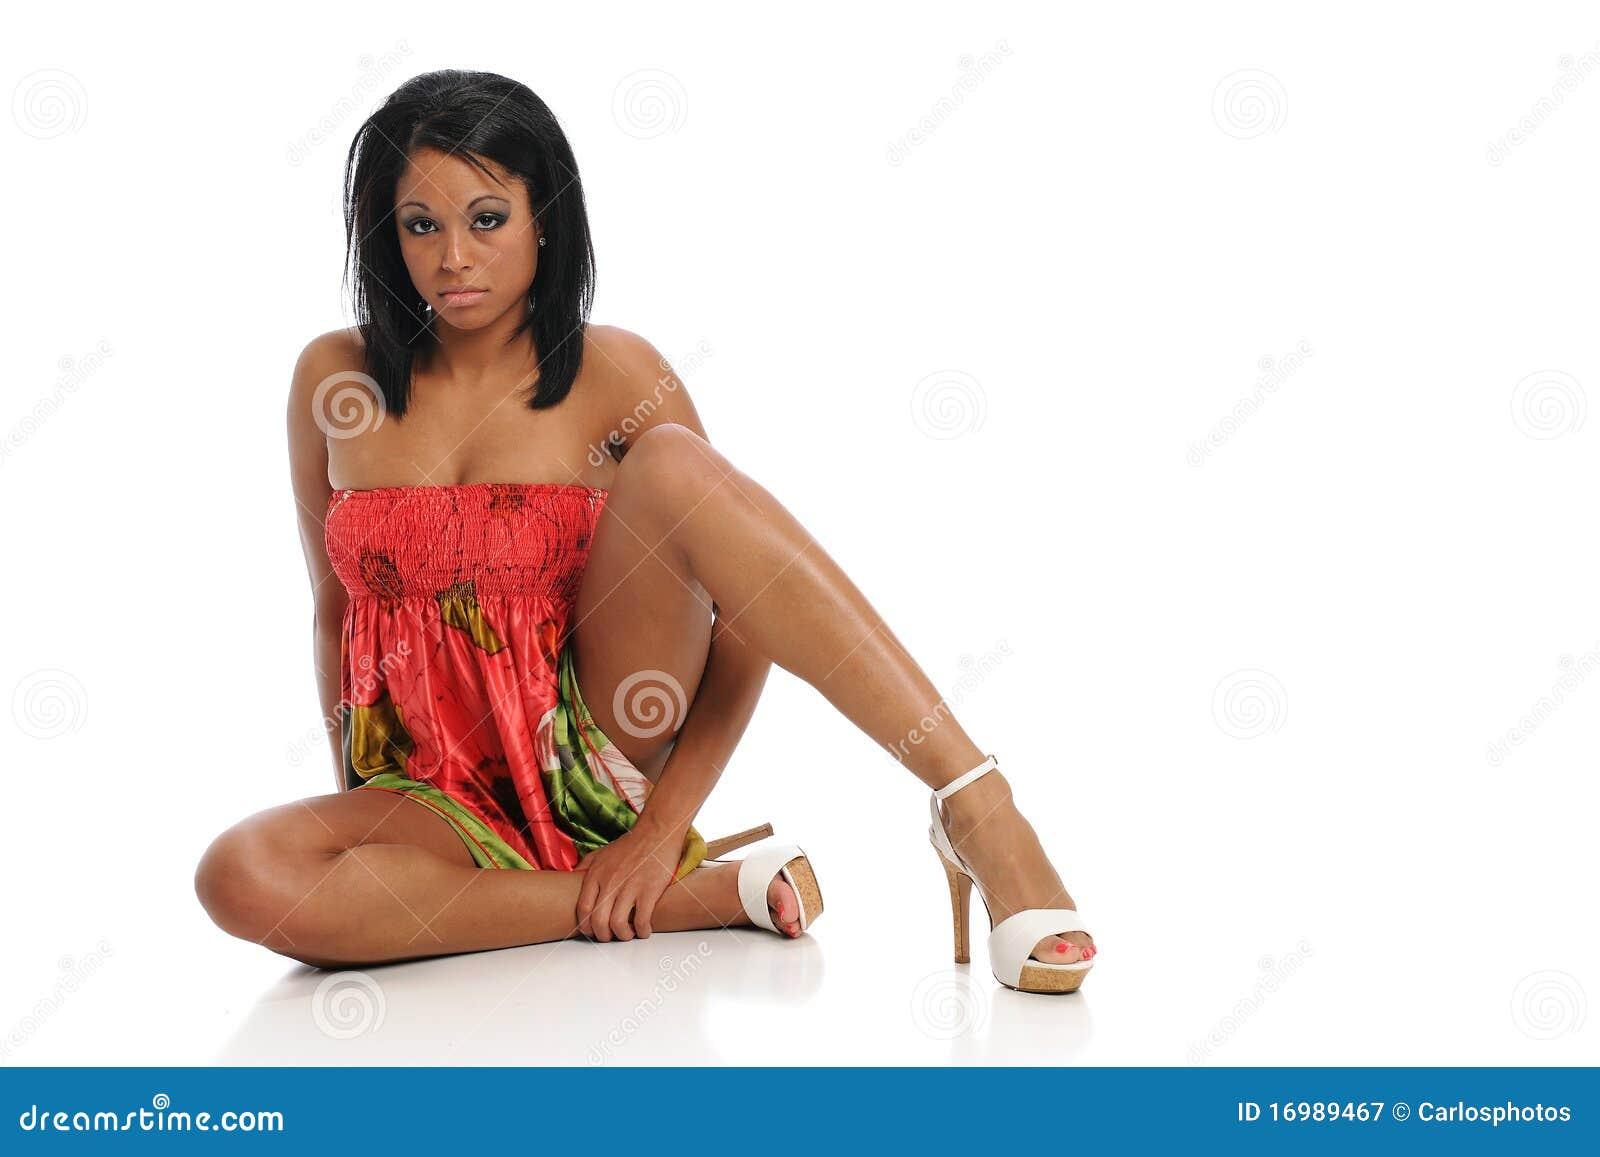 Black Woman Model 104